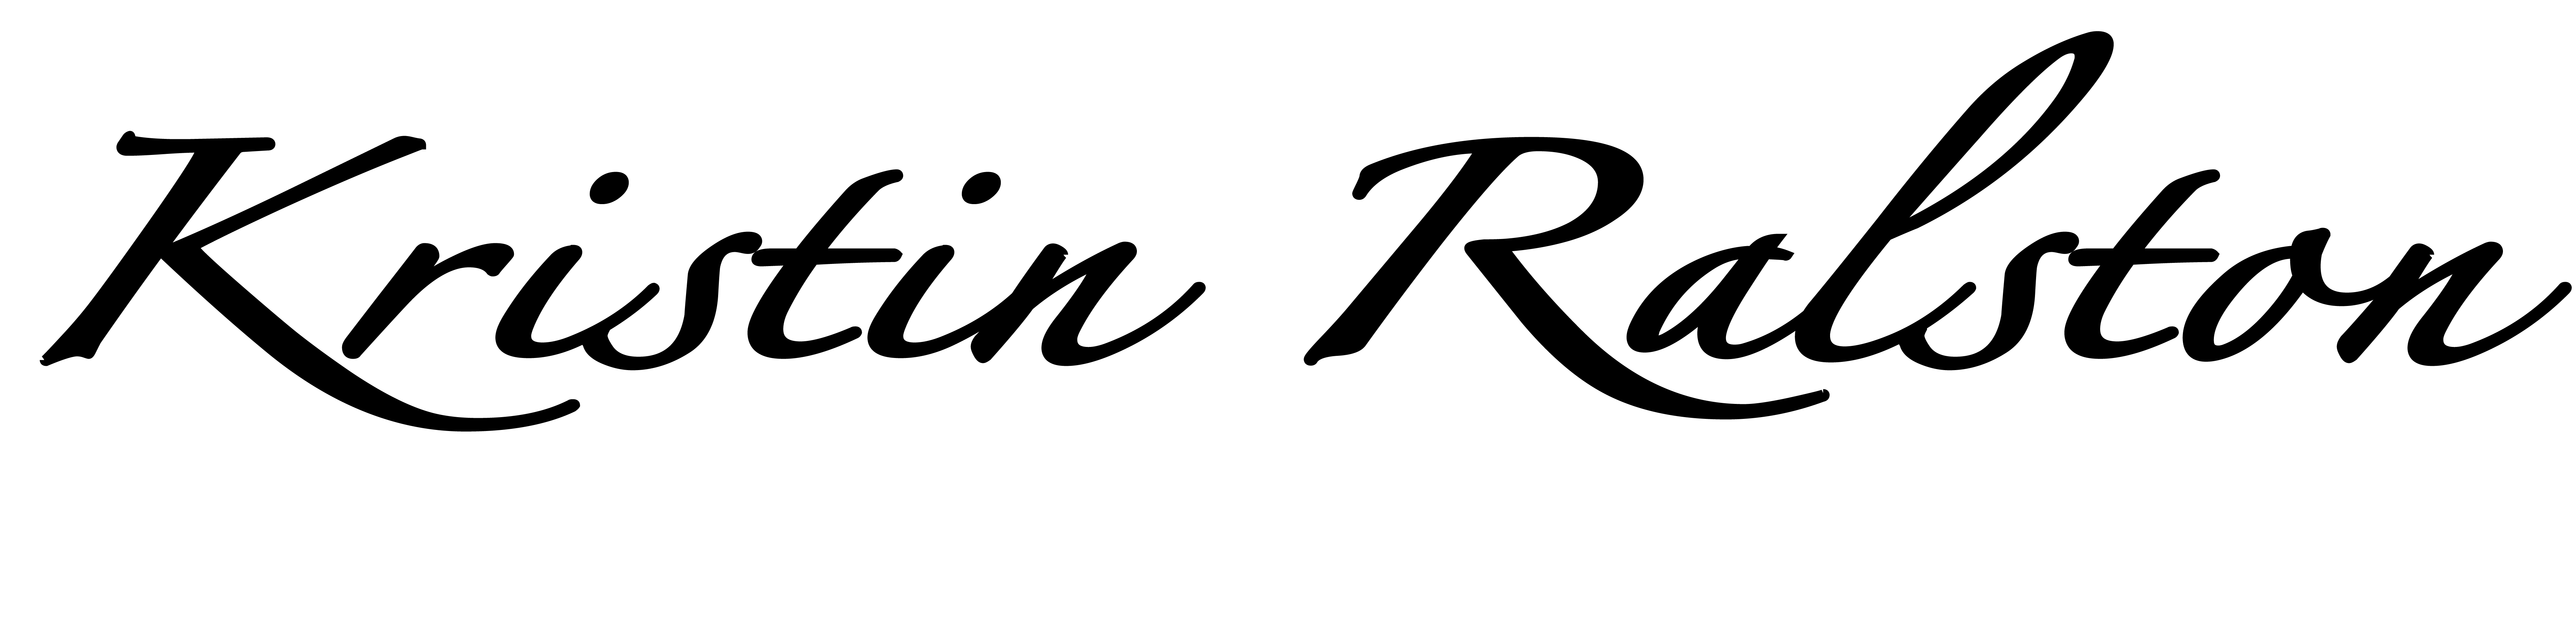 kristin ralston's Signature